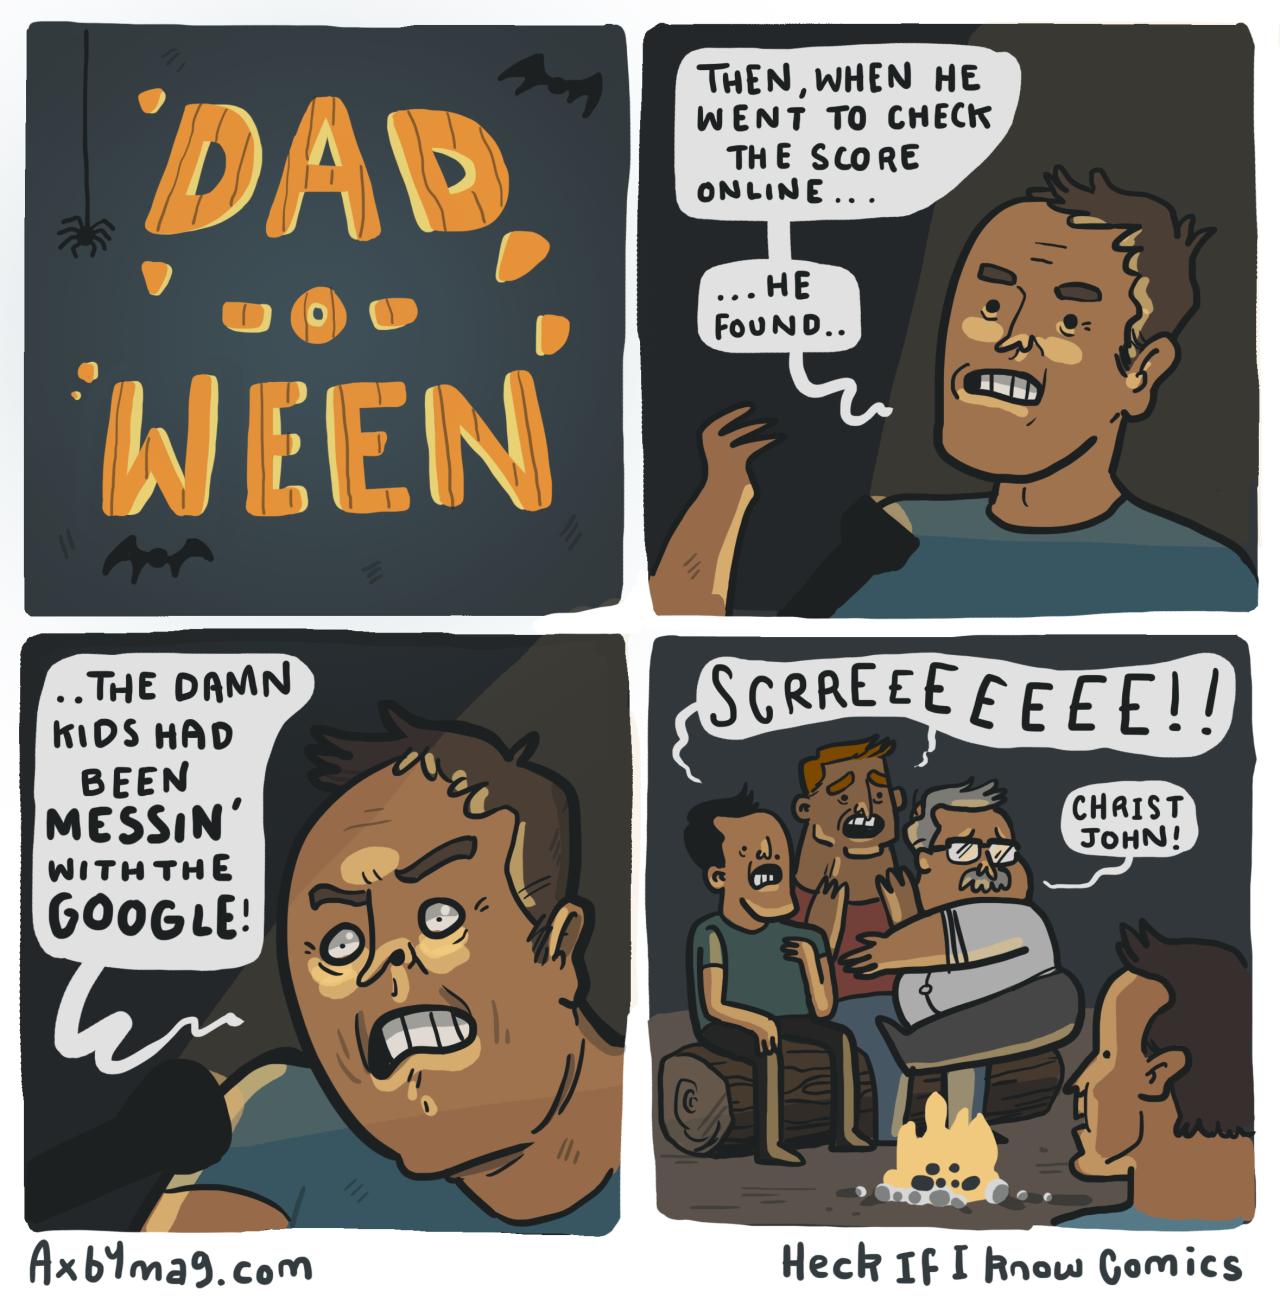 3 spooky 5 me!